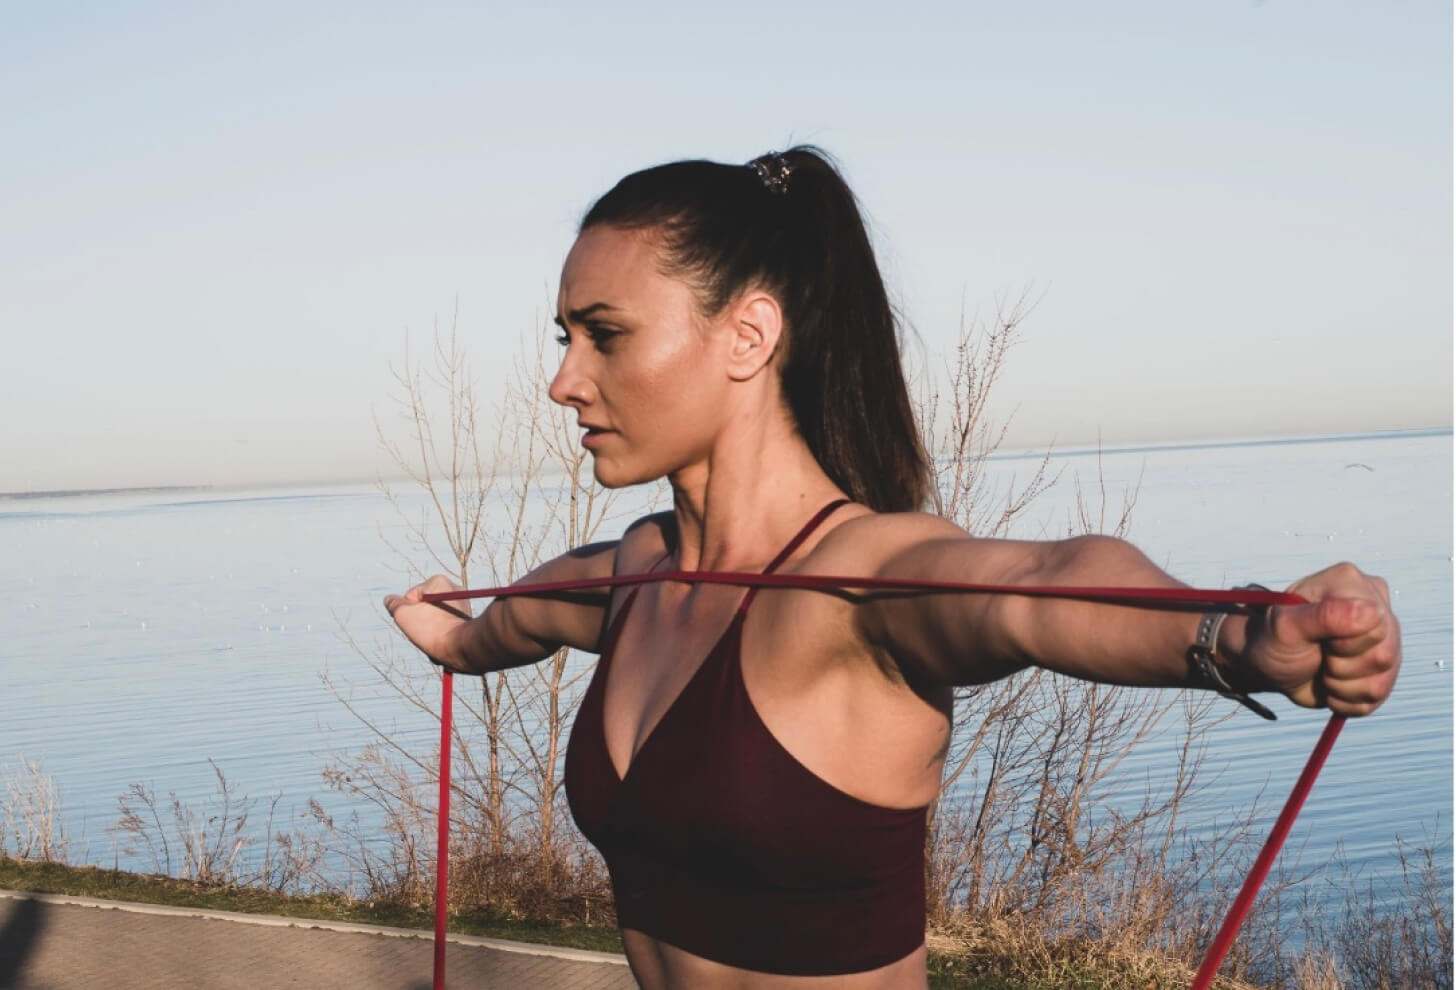 iFIT Member Breanna Maurer does a strength workout